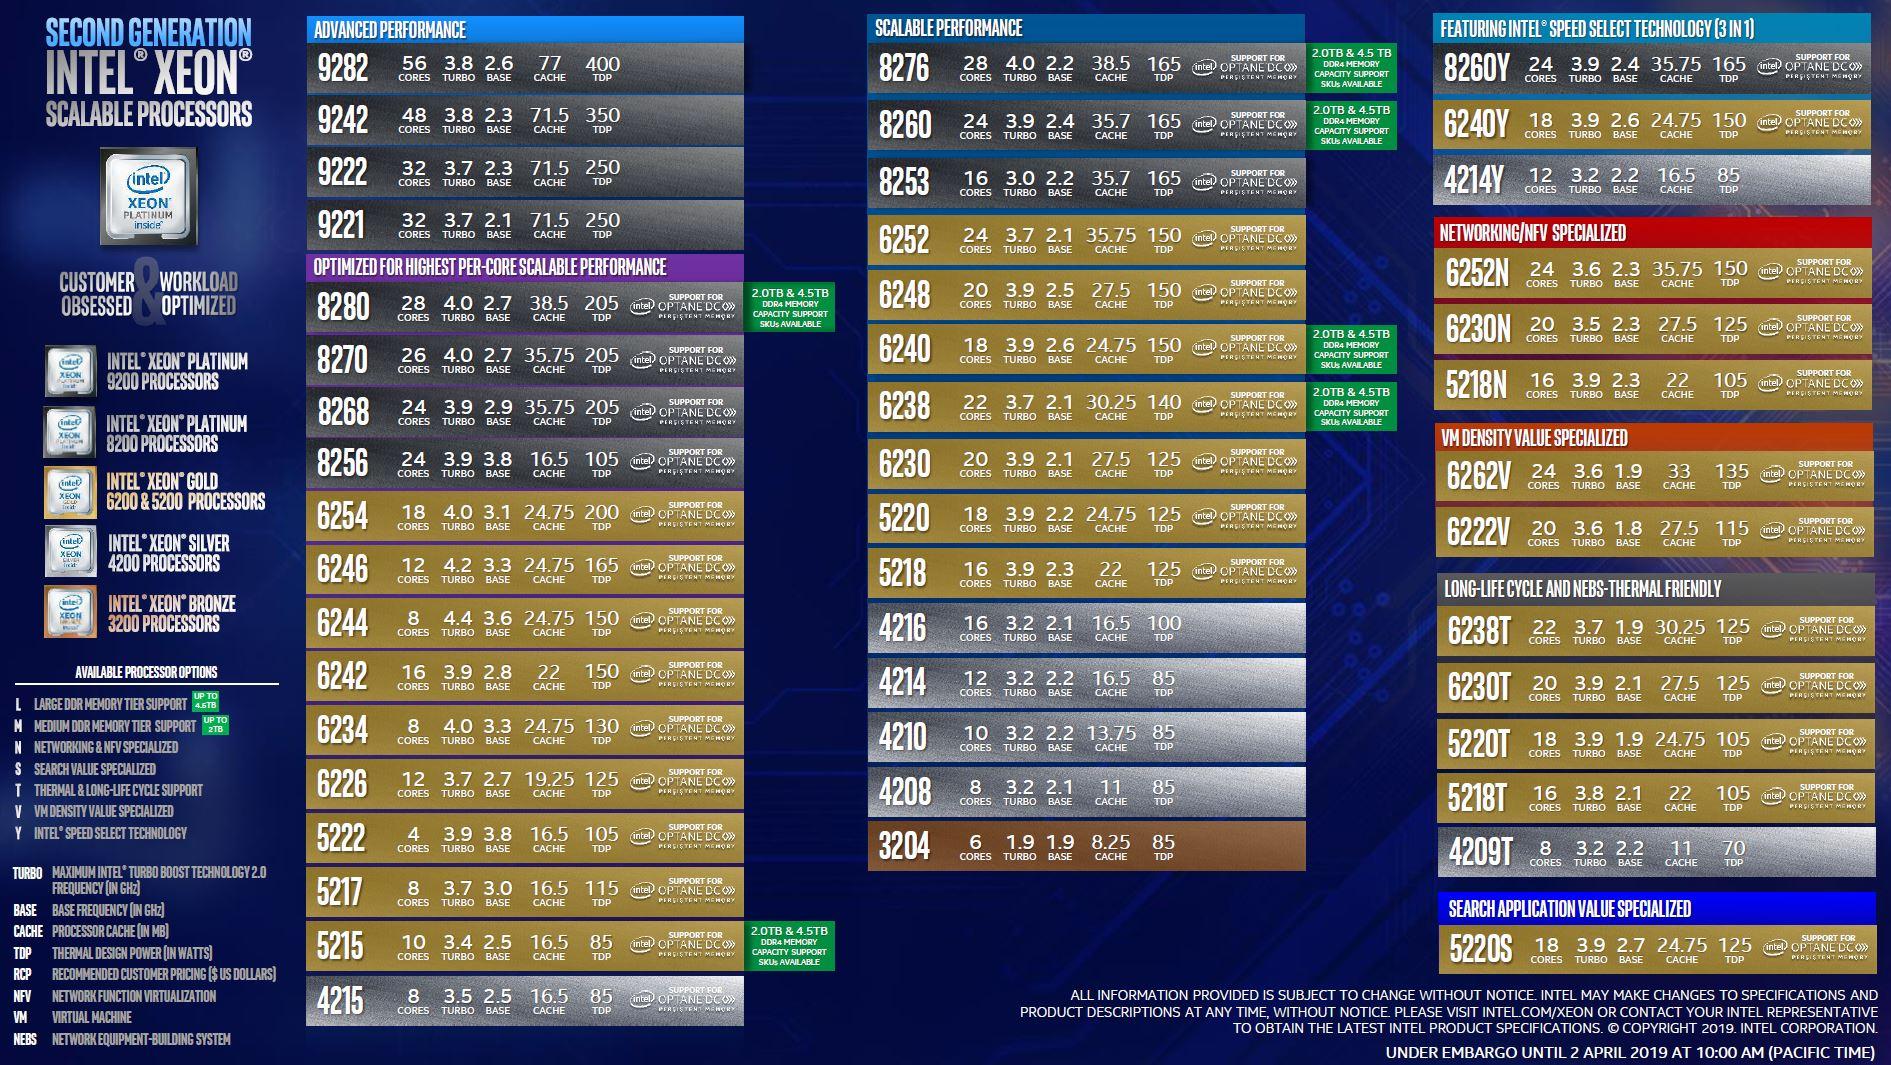 Second Generation Intel Xeon Scalable Processors SKU List 1 Update